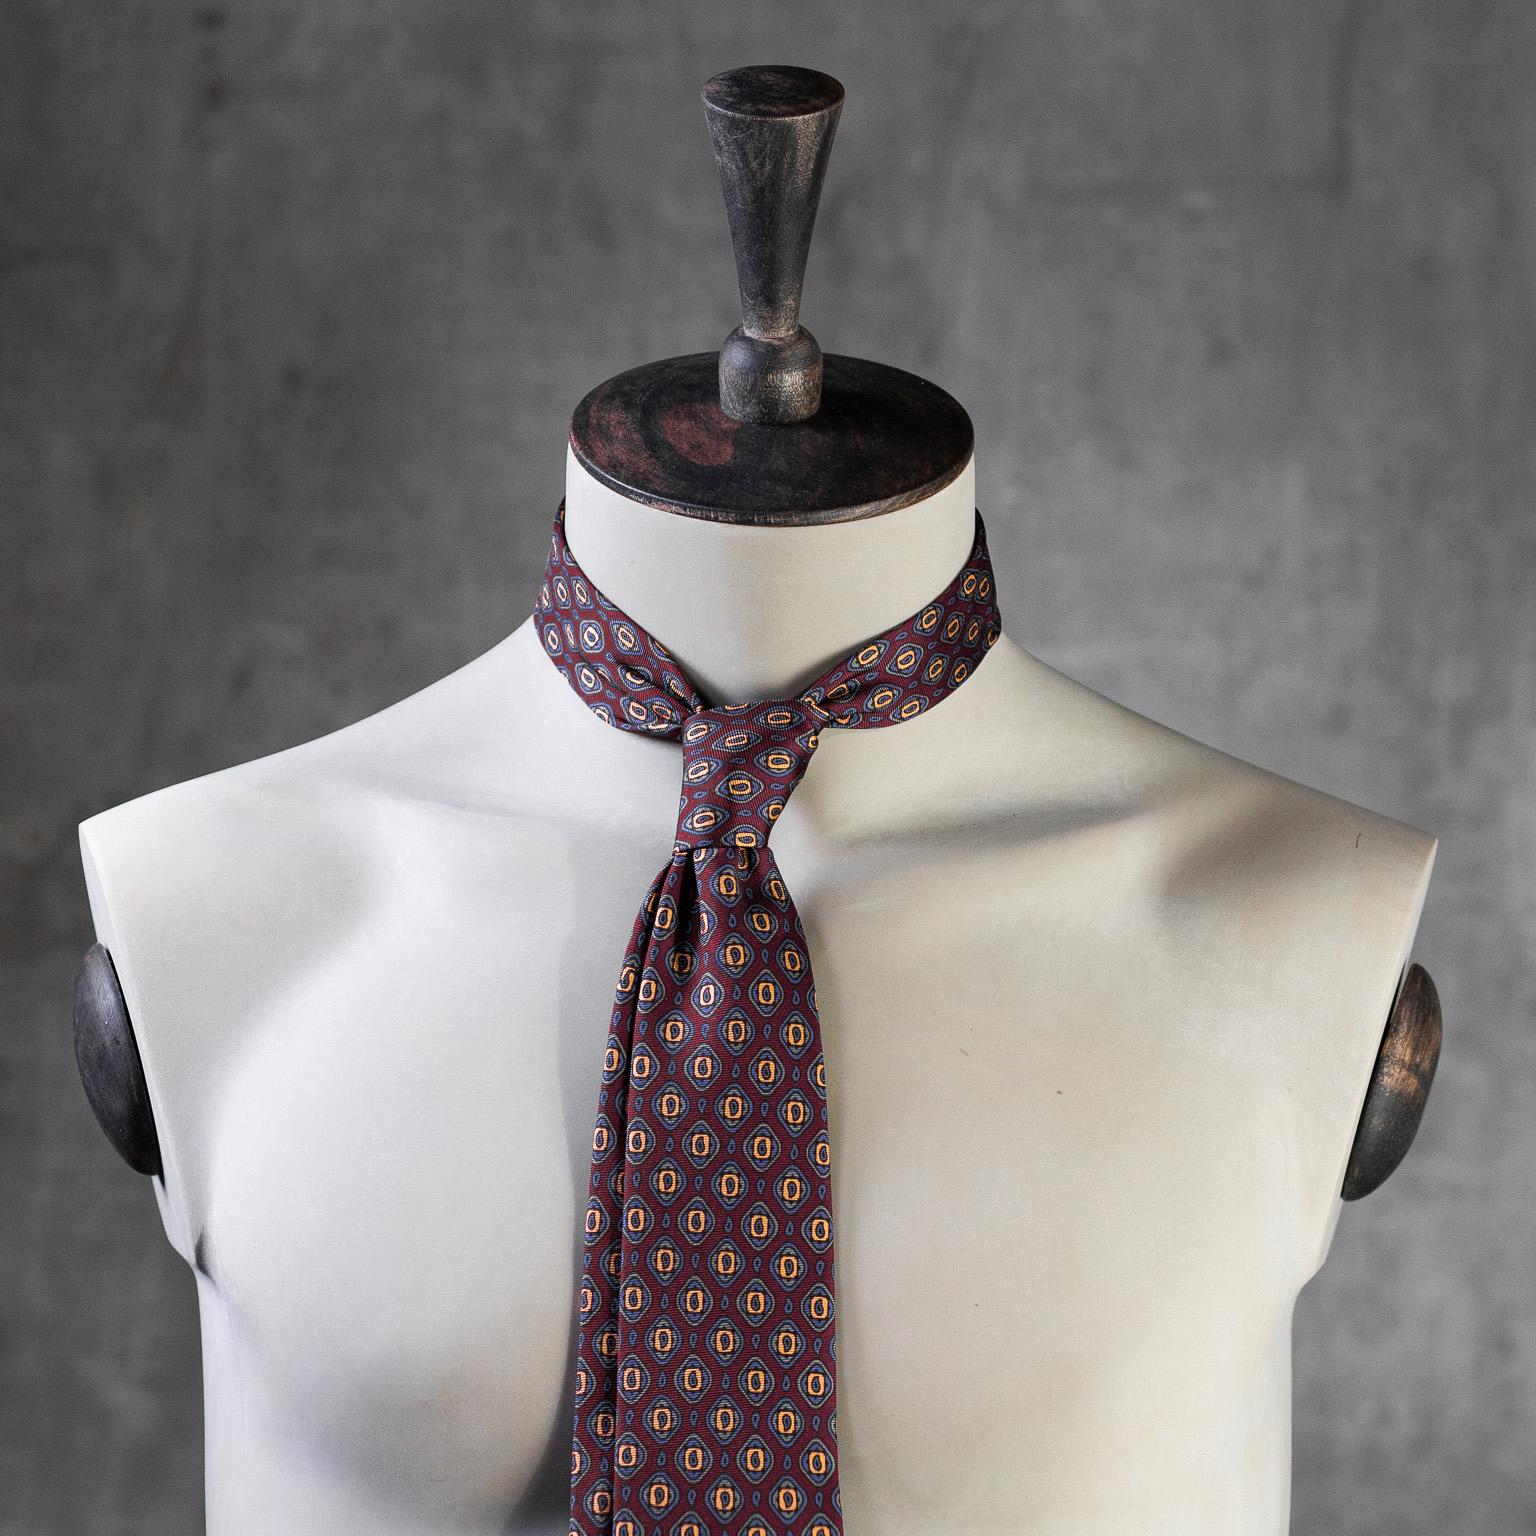 PRINTED-SILK-SEDA-ESTAMPADA-0578-Tie-Initials-Corbata-Iniciales-The-Seelk-2